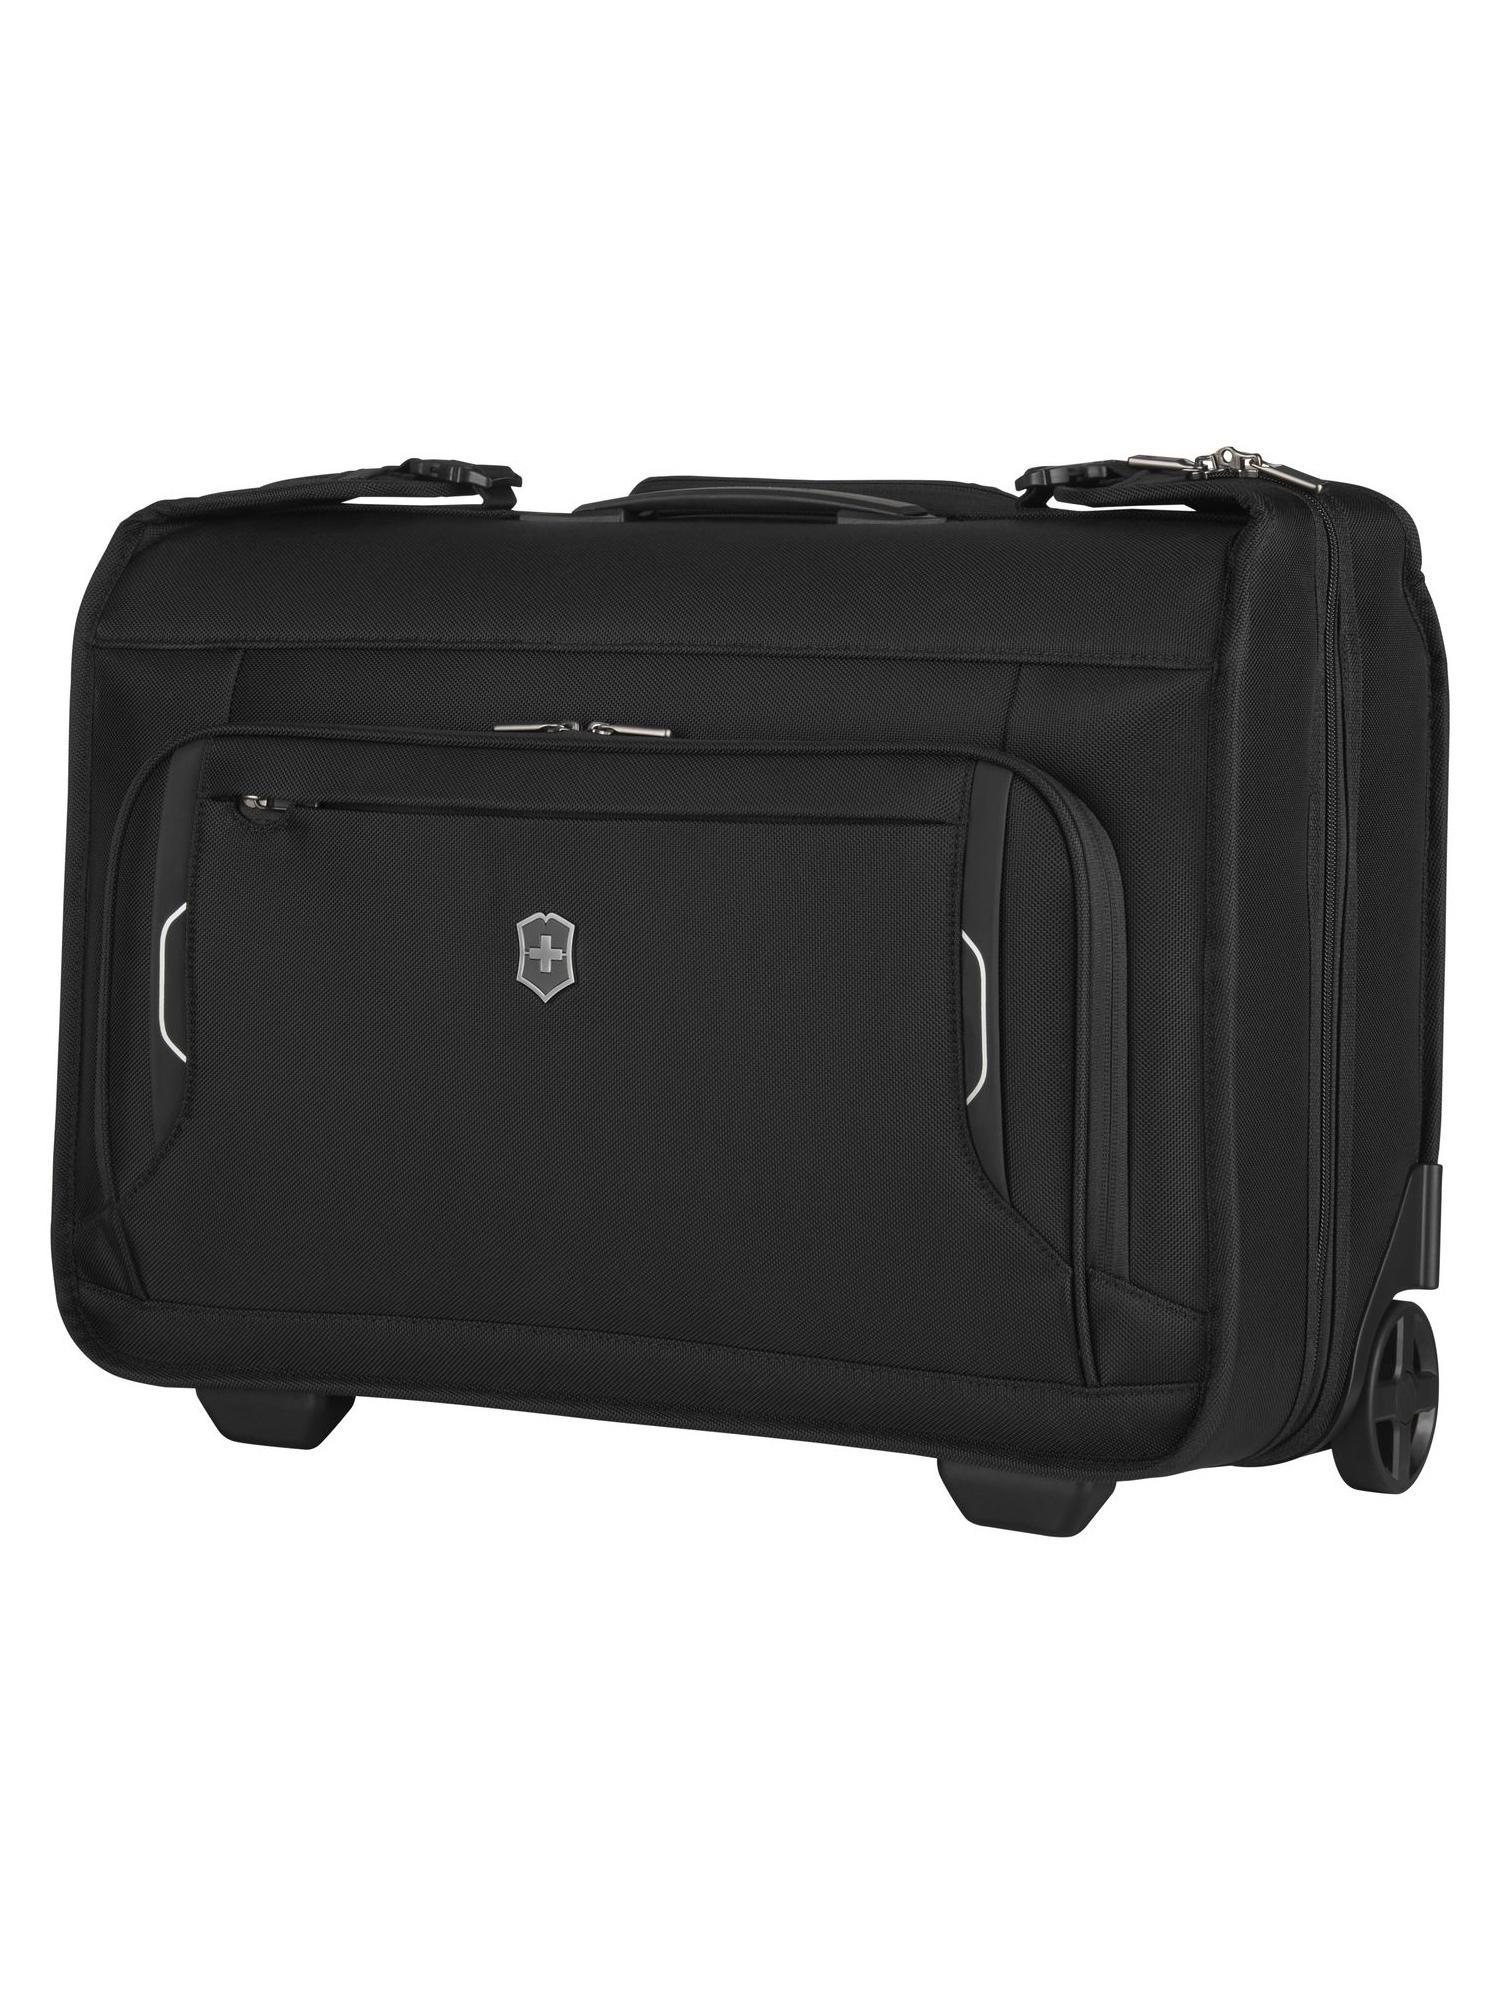 805bbeea3 Victorinox Werks Traveler 6.0 2 Wheeled Garment Sleeve by Victorinox Travel  Gear (606689)